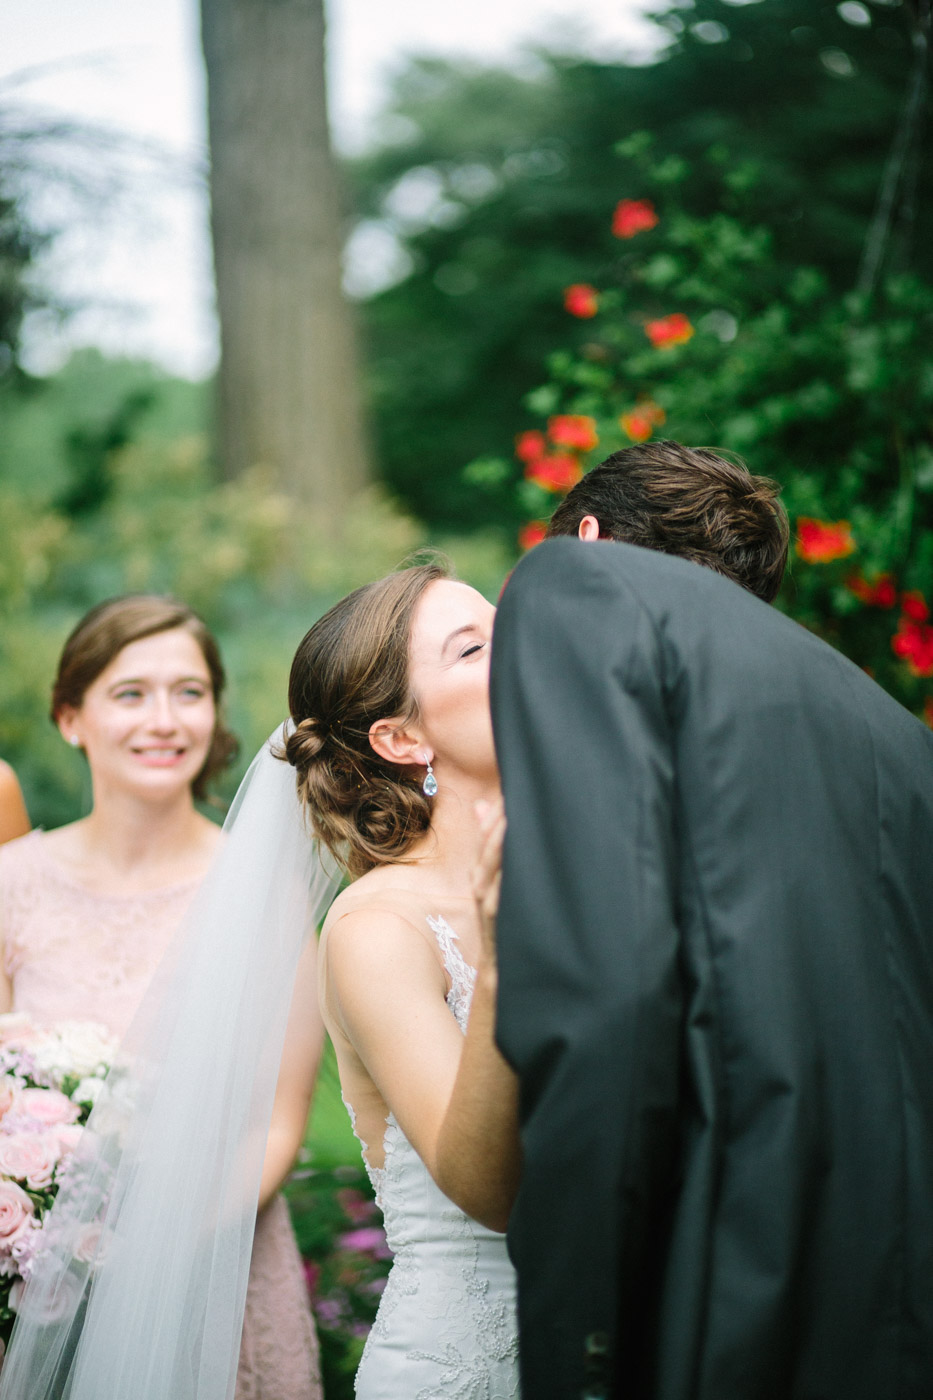 Kelly & Ben Wedding Web 2016-171.jpg